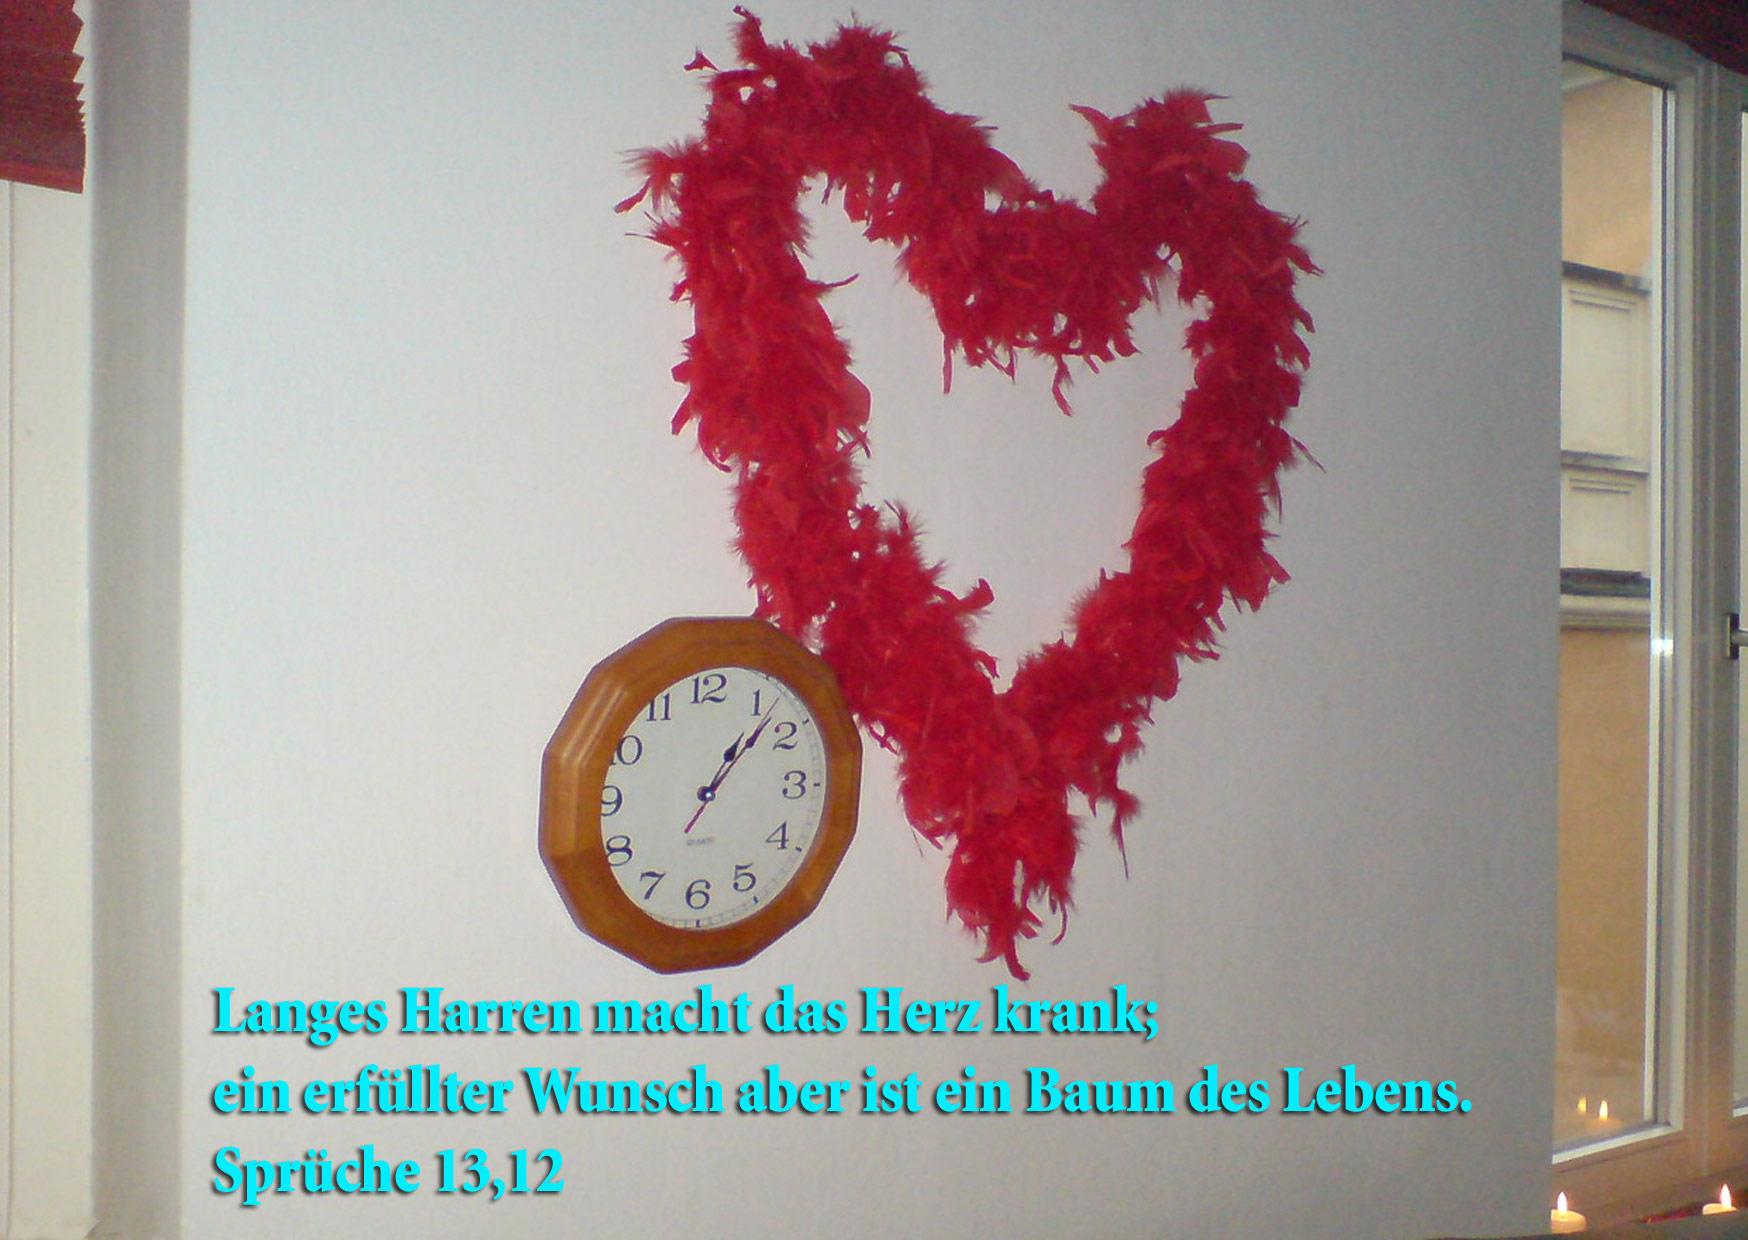 Herz, Sprüche13,12 Foto: Christine Danzer go 4 Jesus,